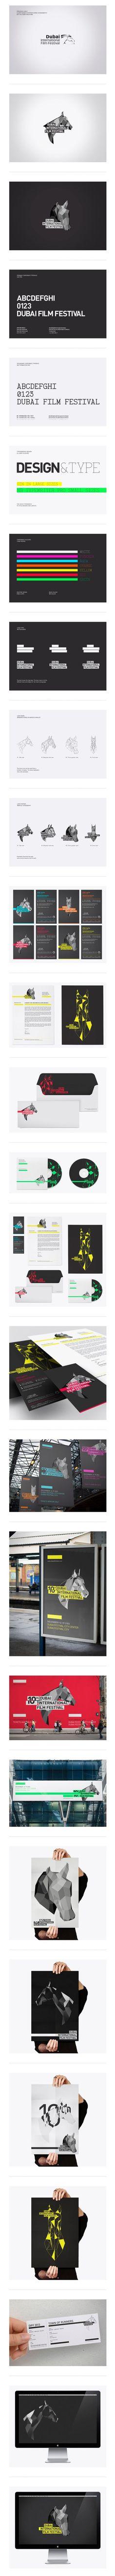 Food   Illustration   Description   Dubai International Film Festival, 2013.  Redesign of Brand Identity.    – Read More –